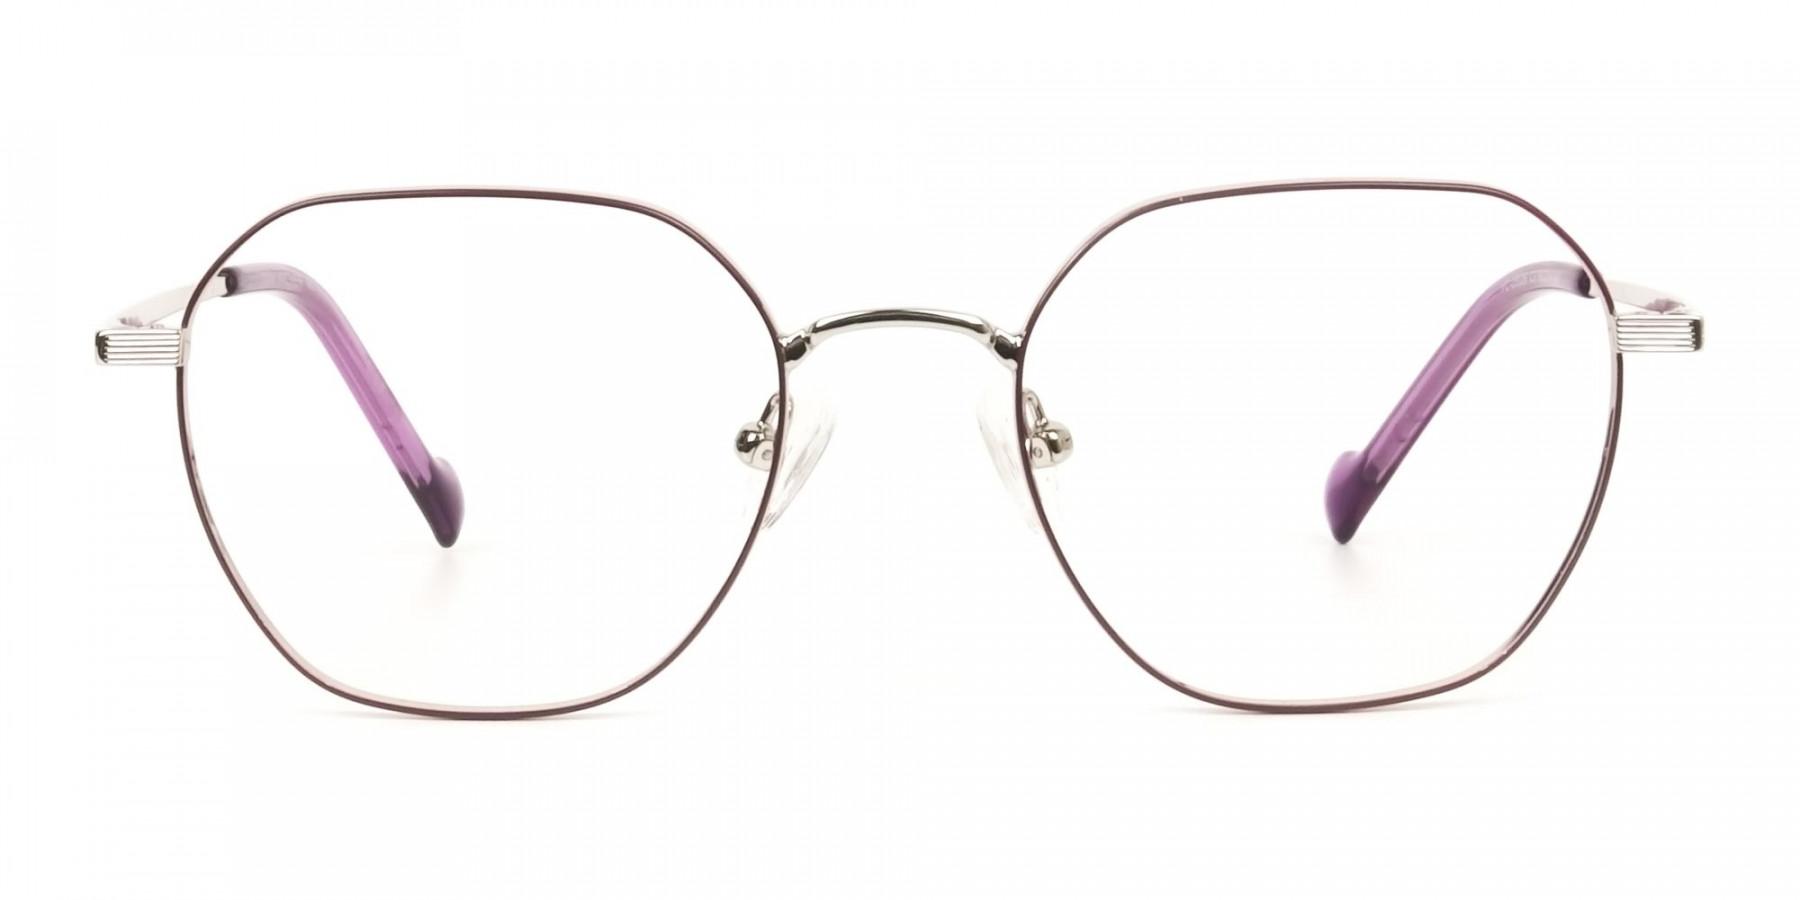 Silver Plum Purple Geometric Glasses in Hexagon Shape - 1